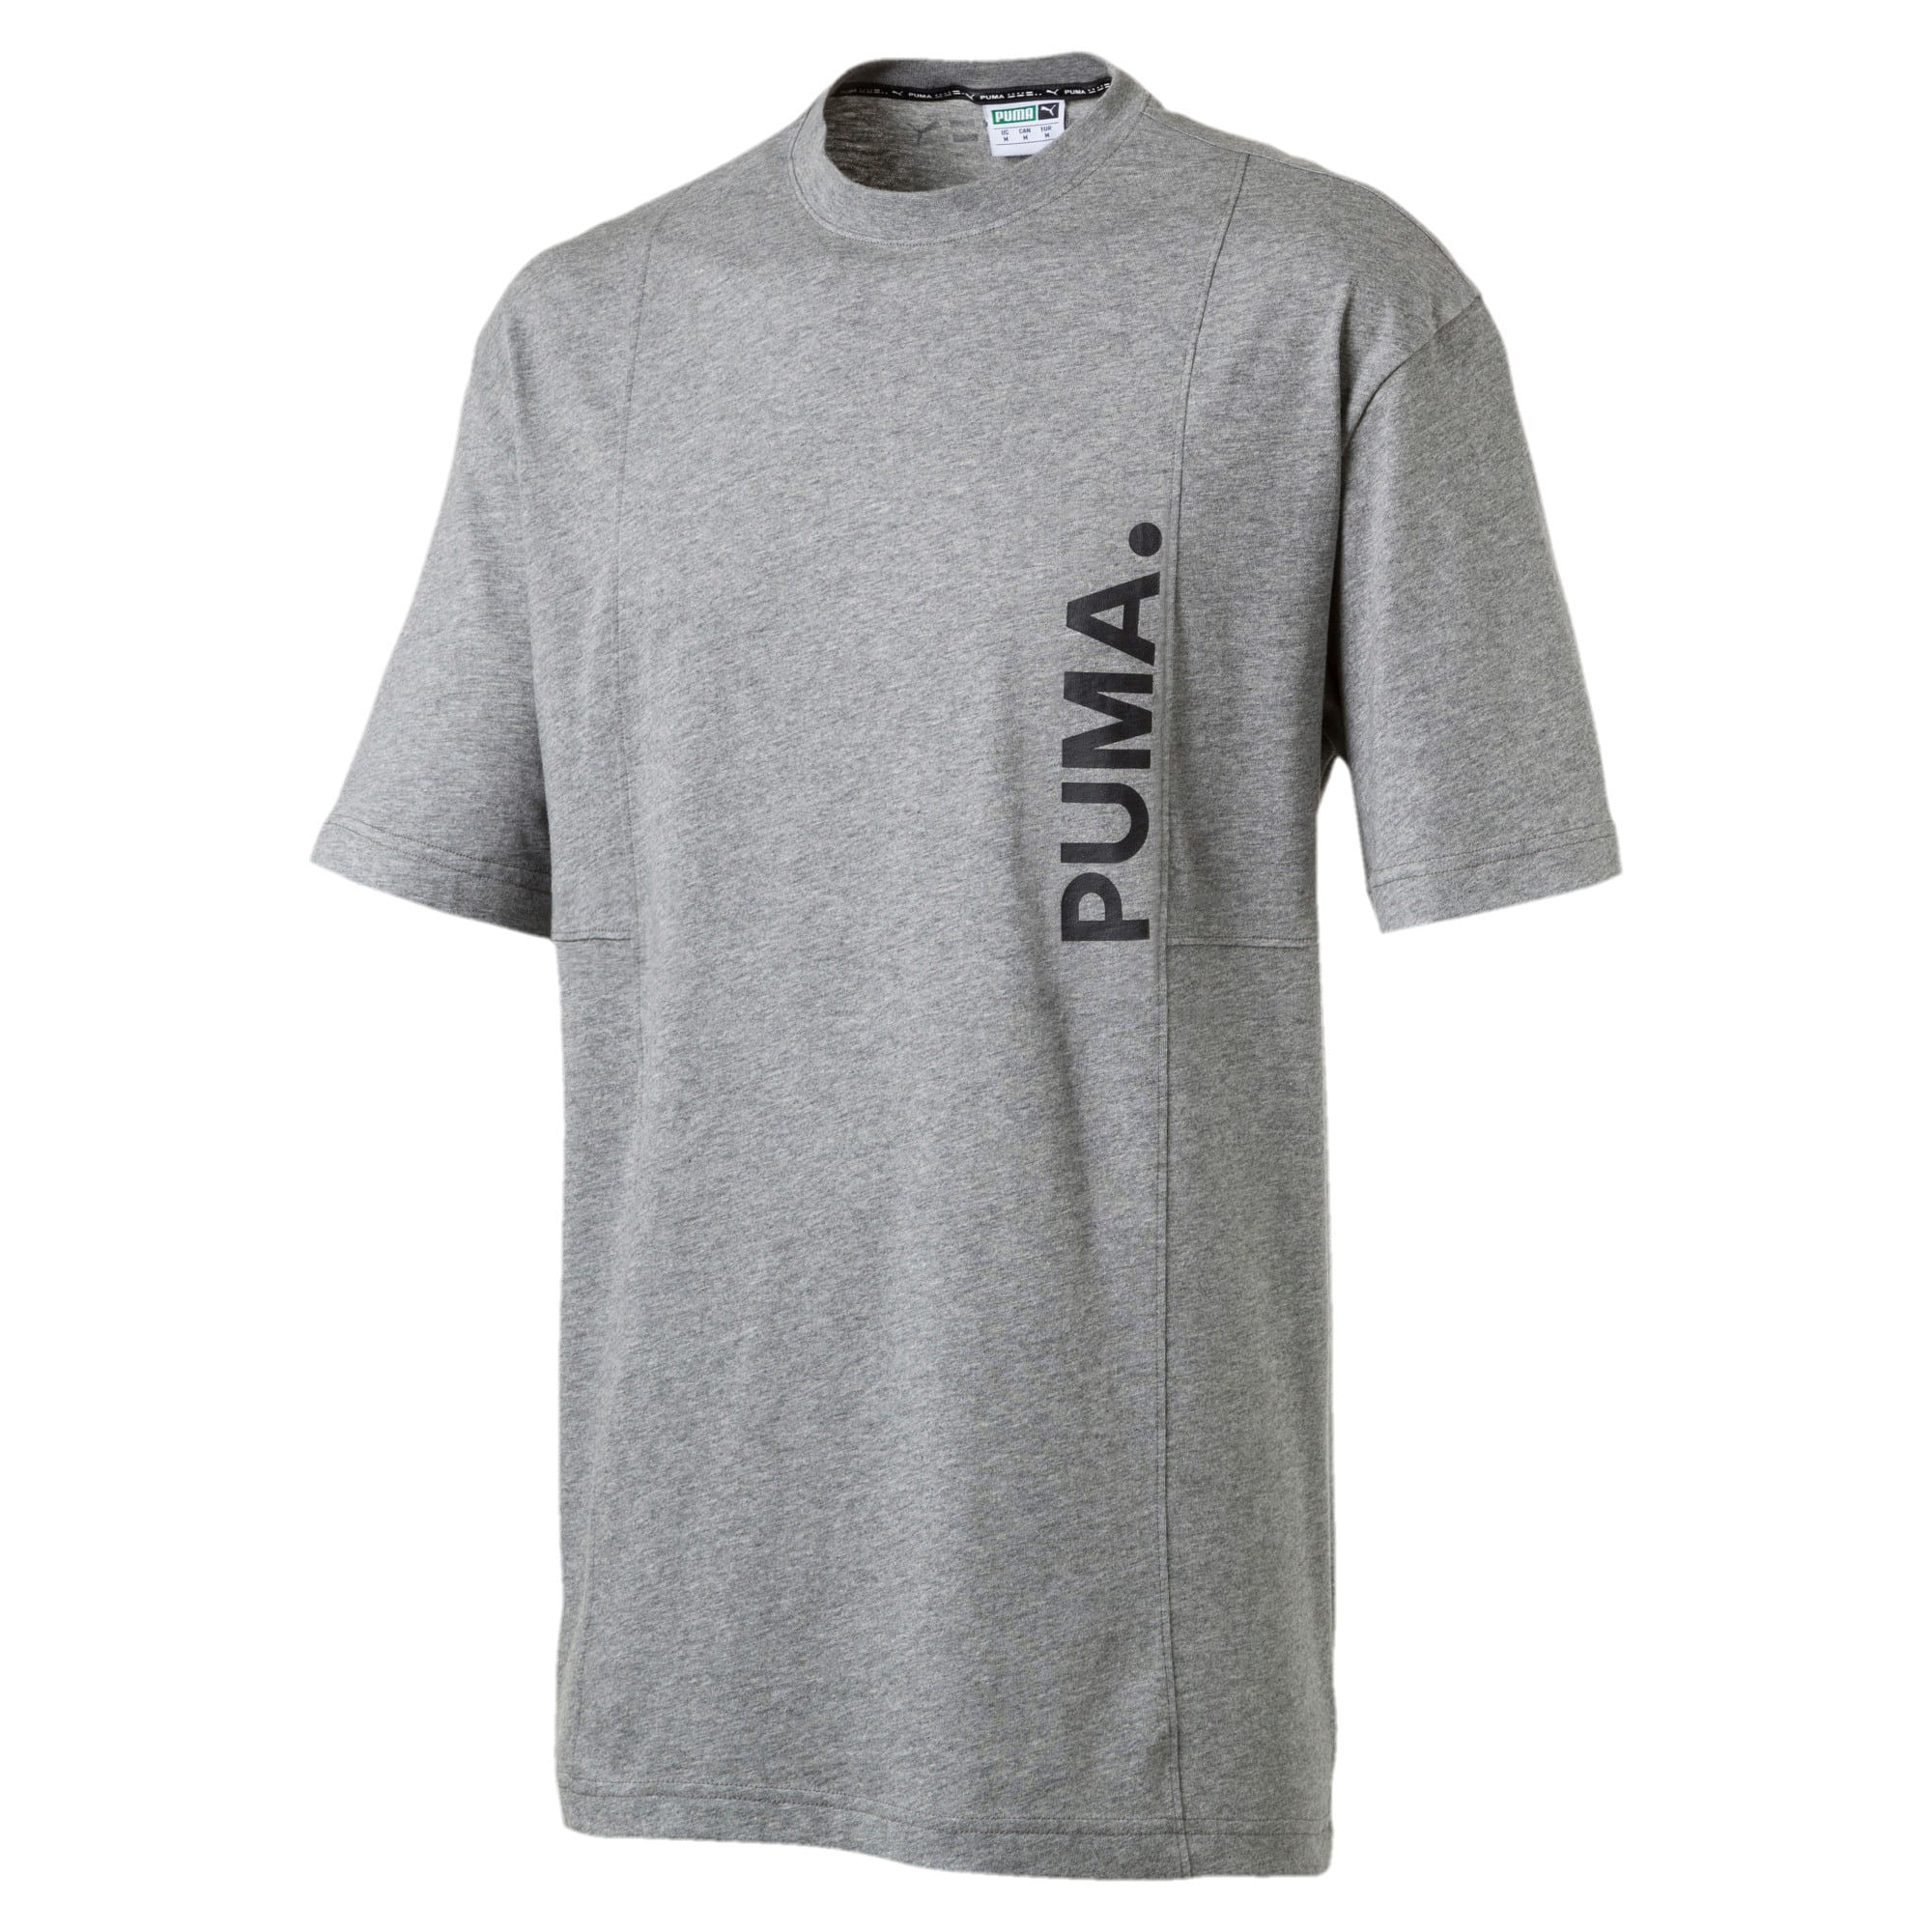 Thumbnail 4 of T-Shirt Epoch pour homme, Medium Gray Heather, medium